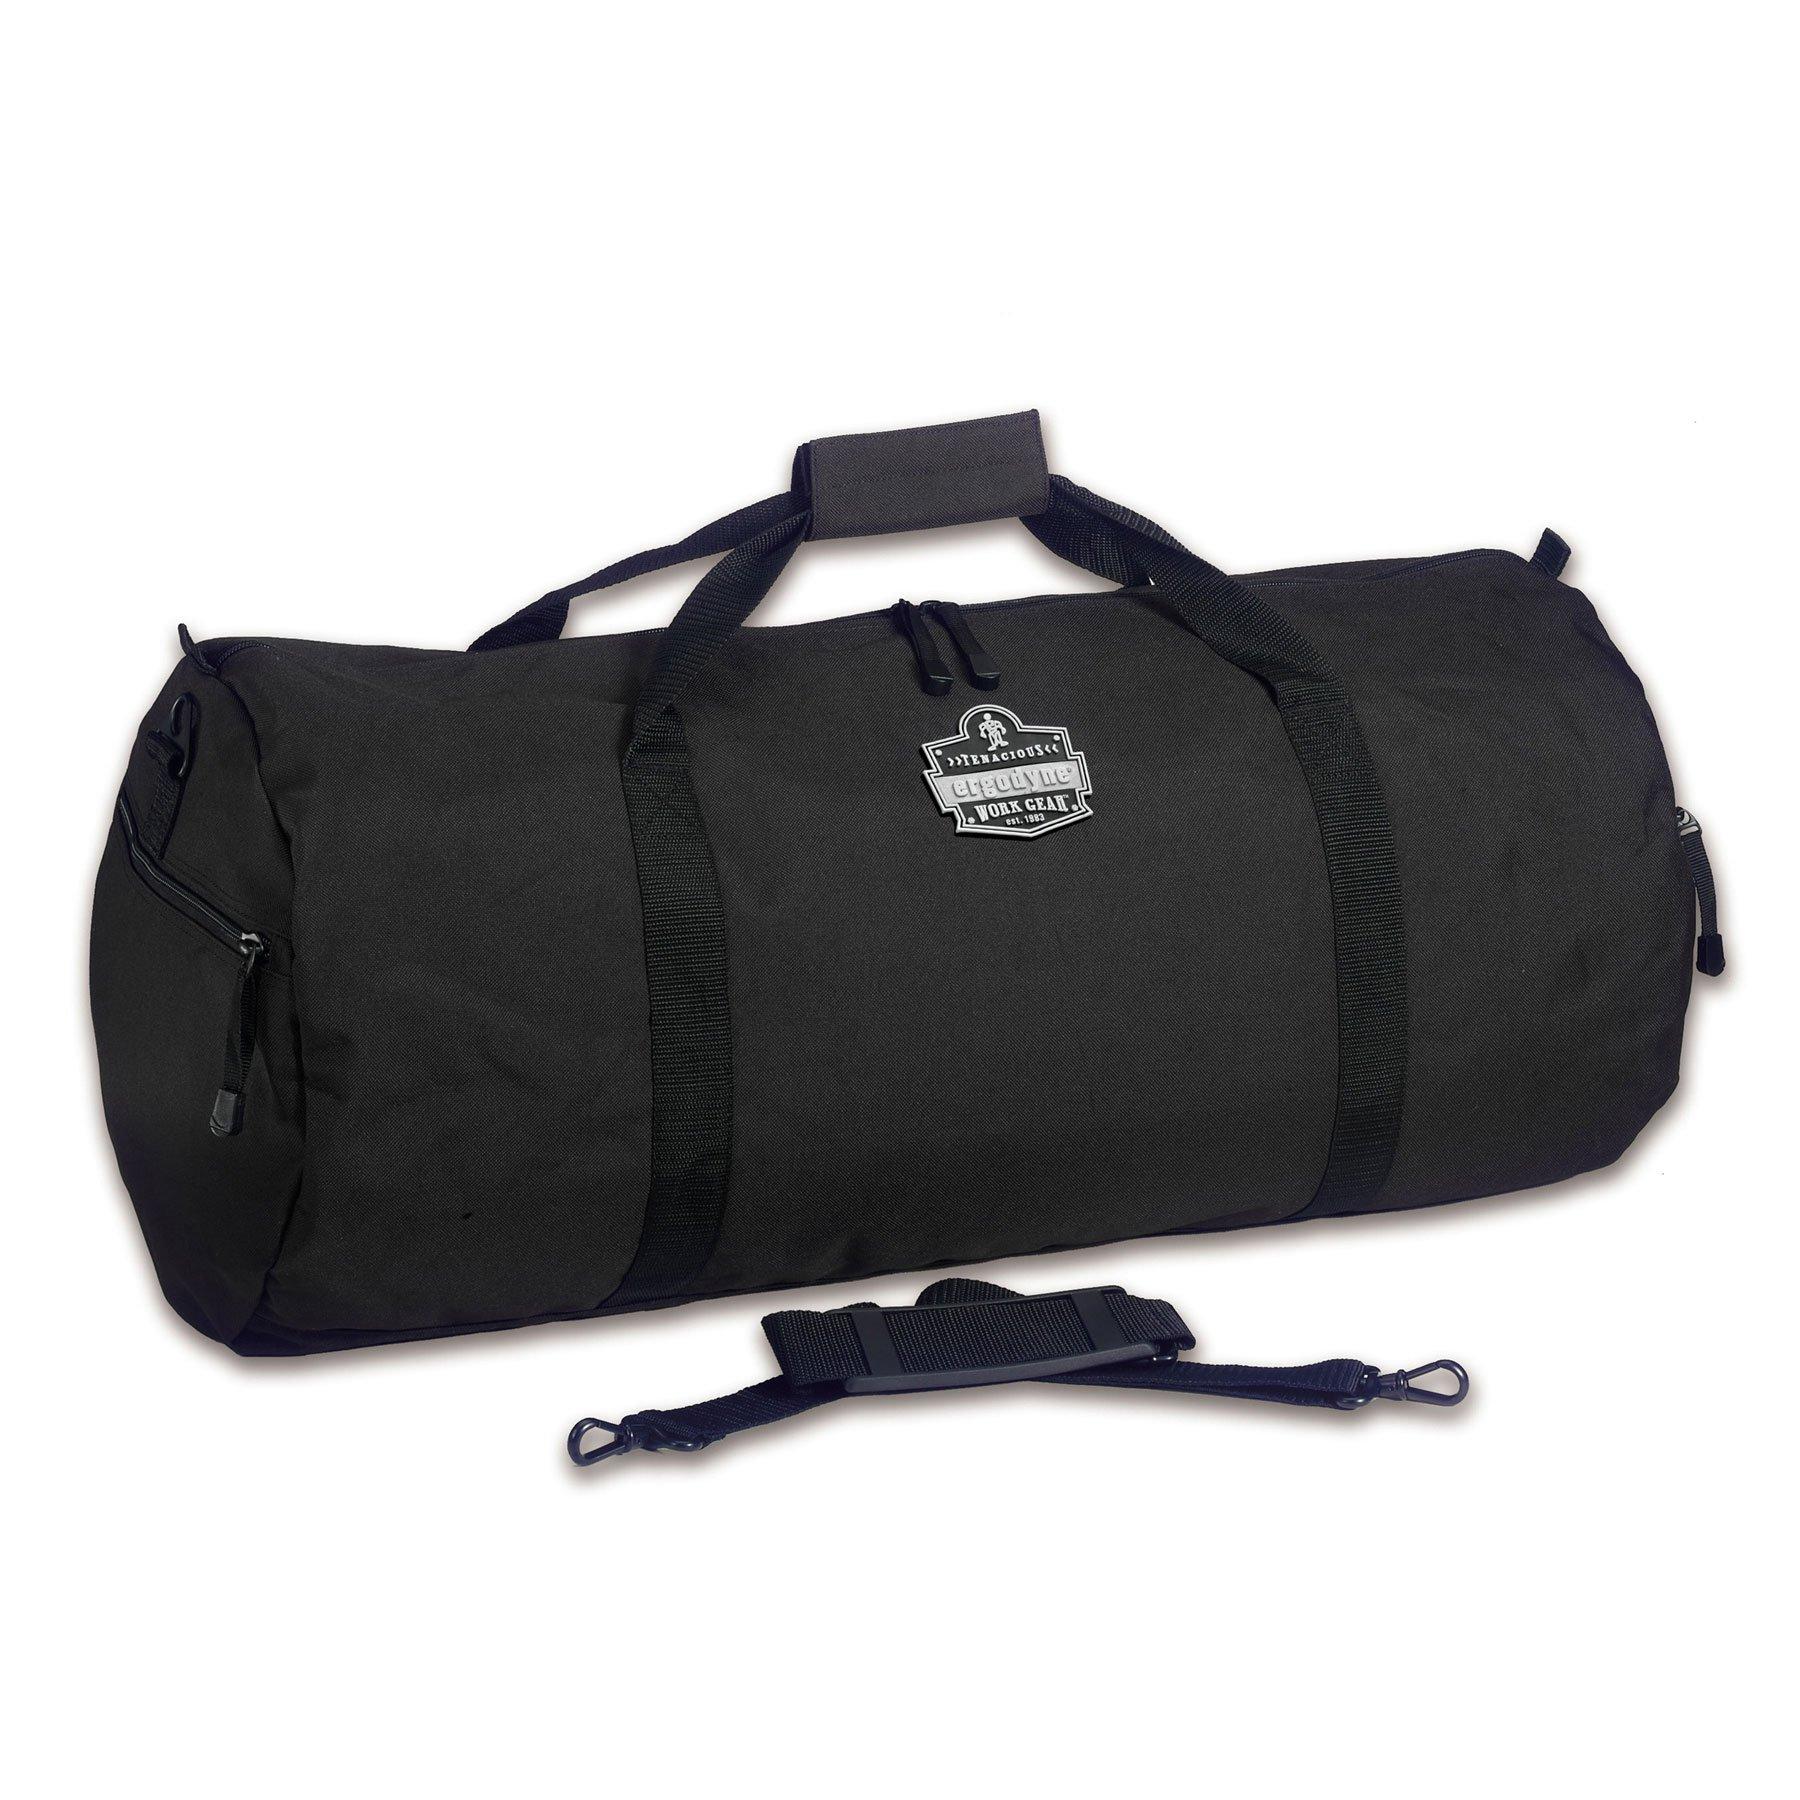 Ergodyne - GB5020P S Black Duffel Bag -Small-Poly